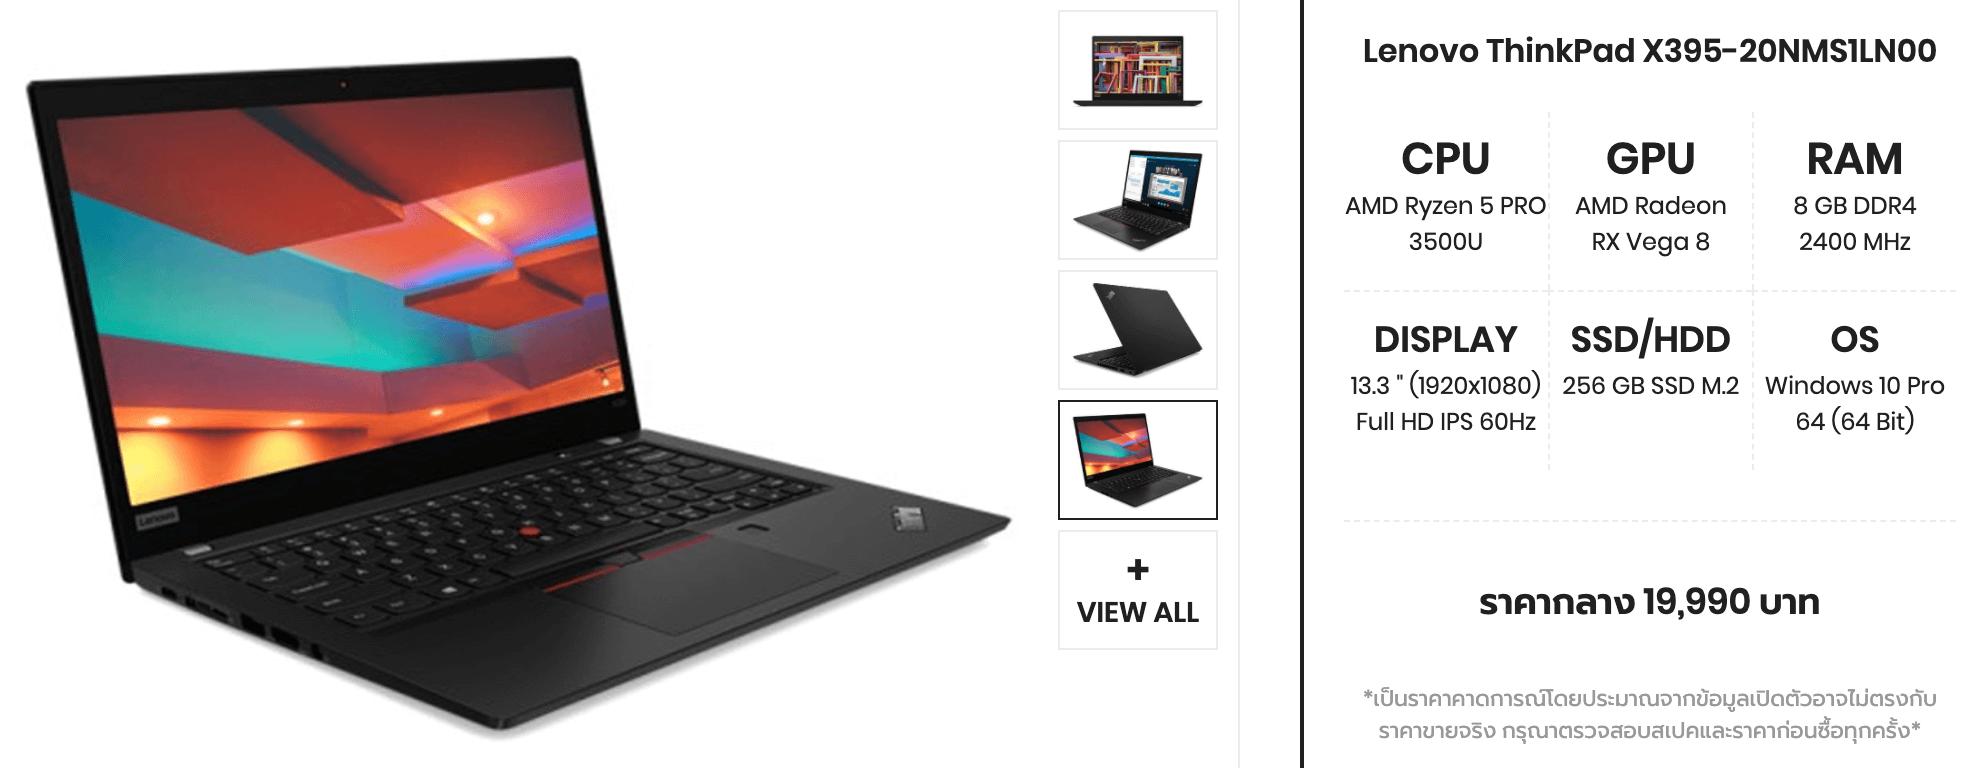 Lenovo ThinkPad X395 20NMS1LN00